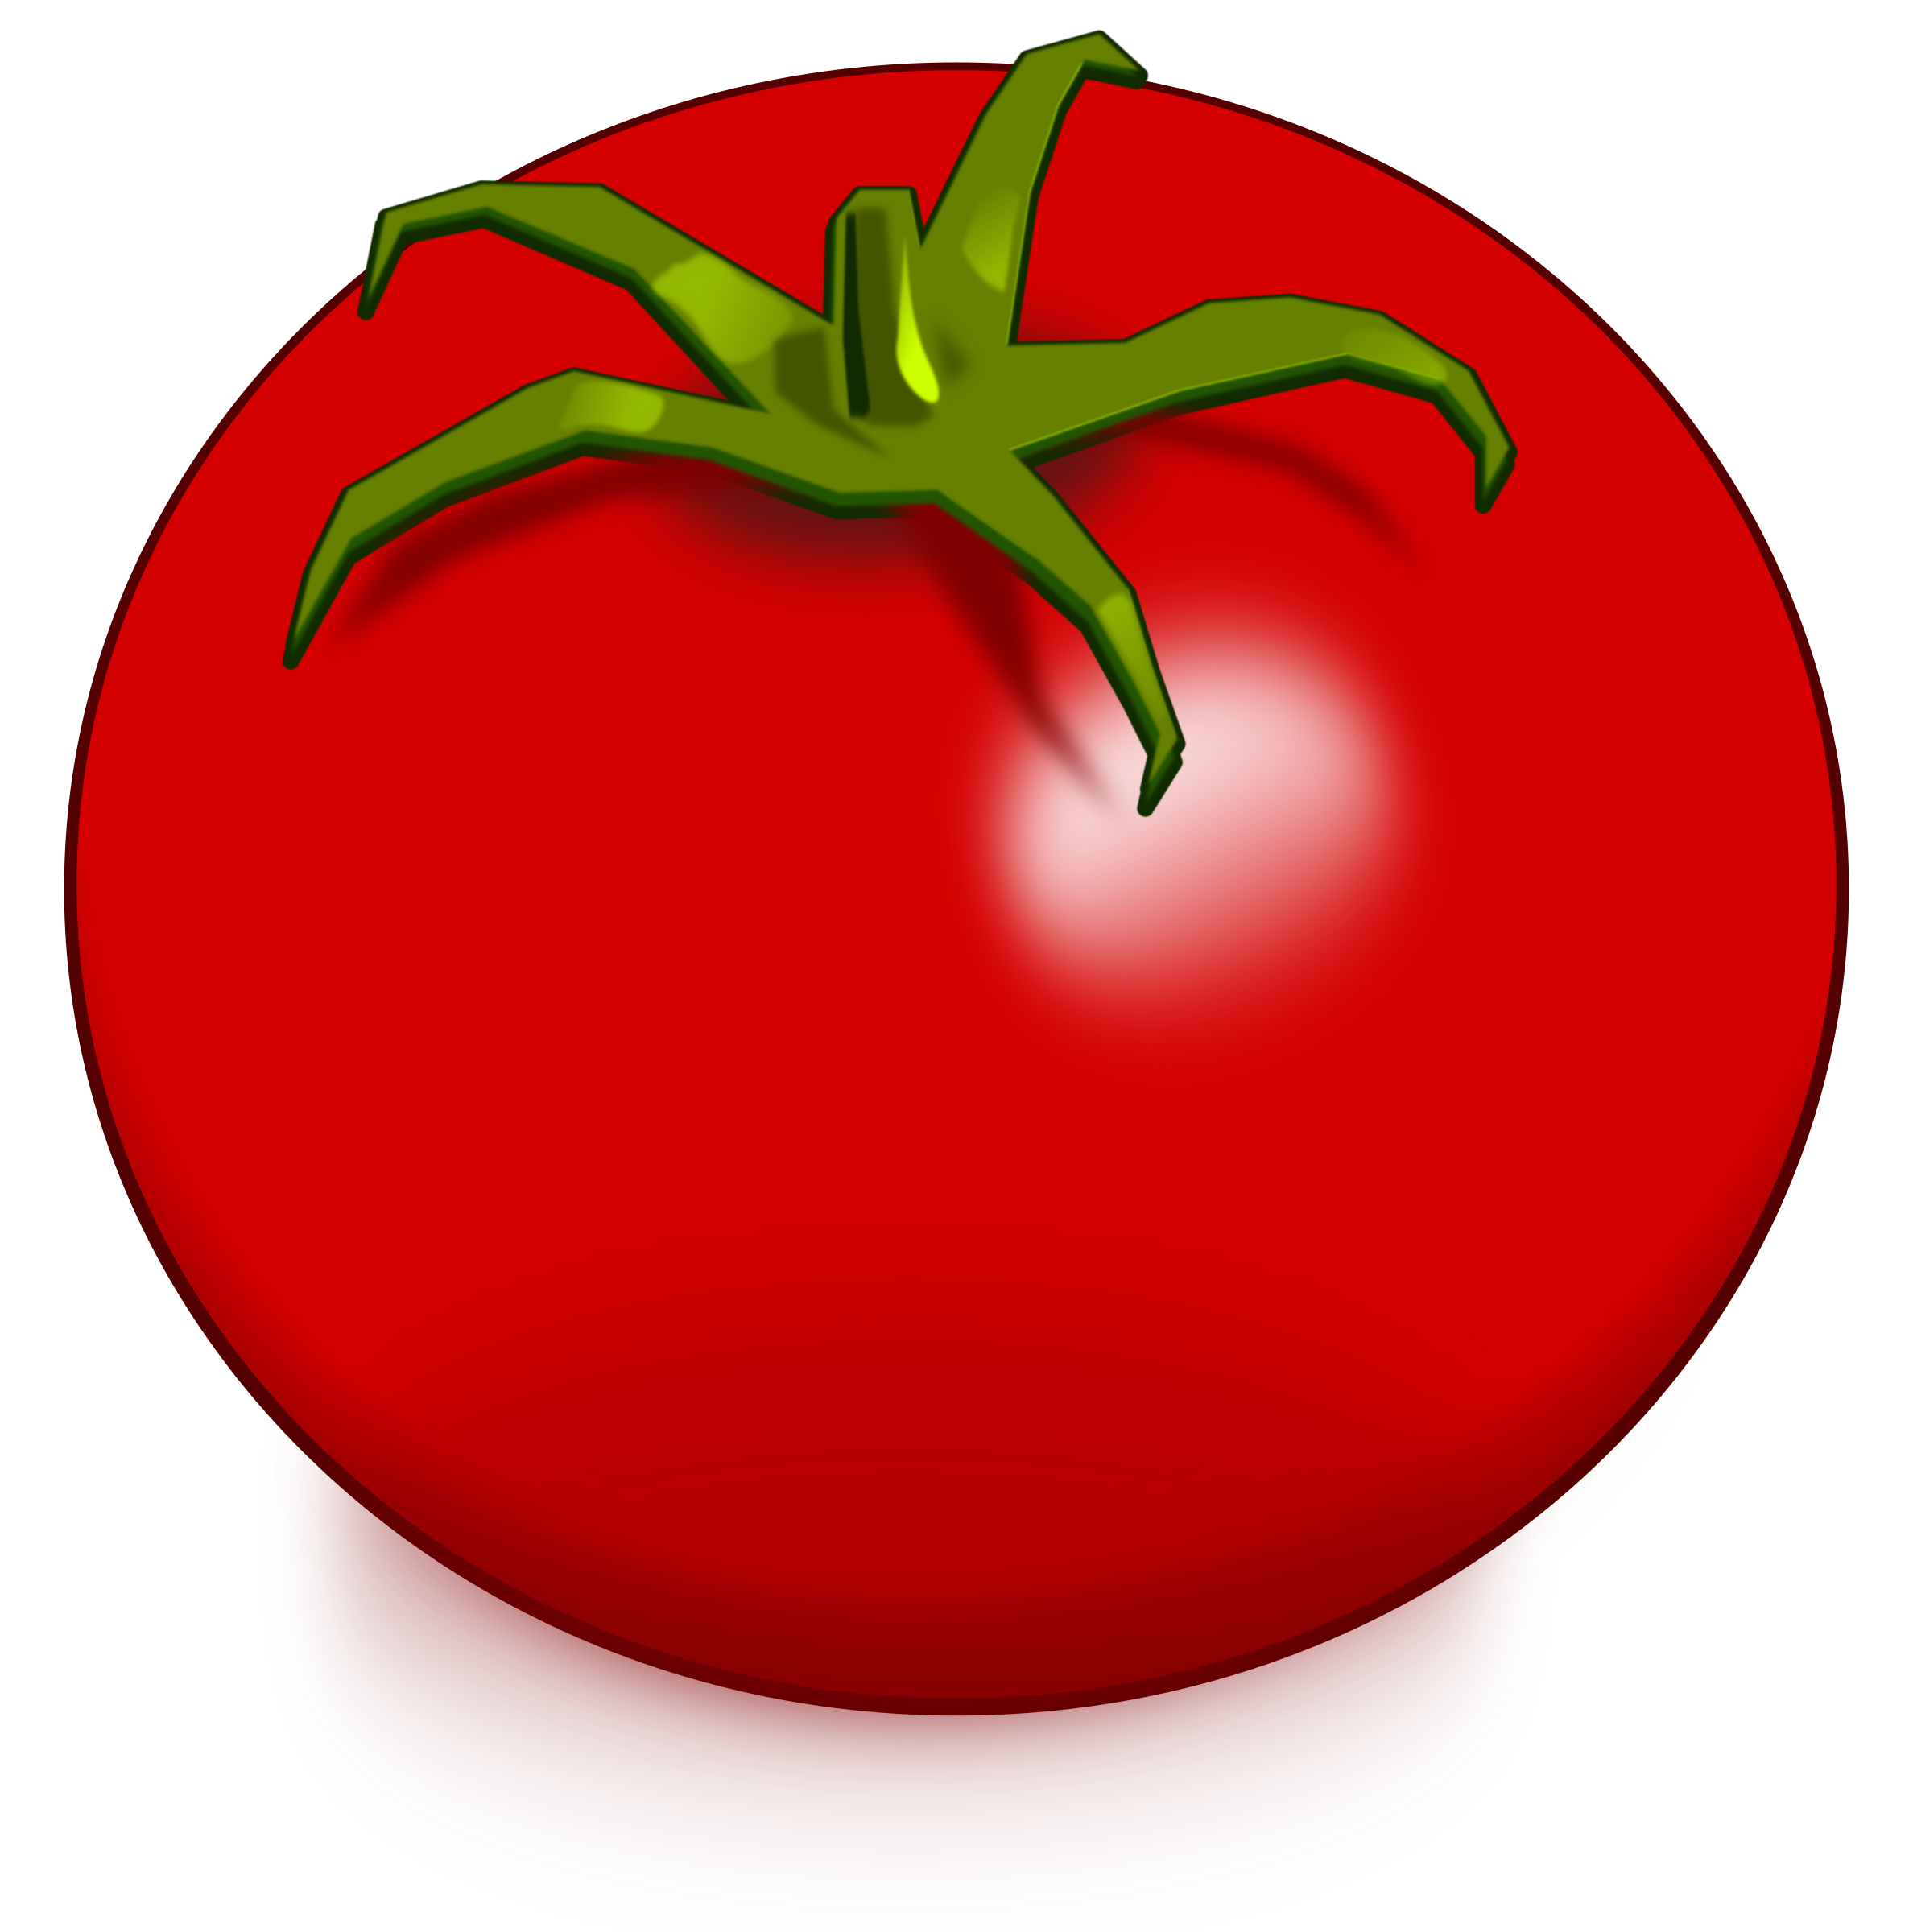 Tomatoe remix big image. Tomatoes clipart healthy food